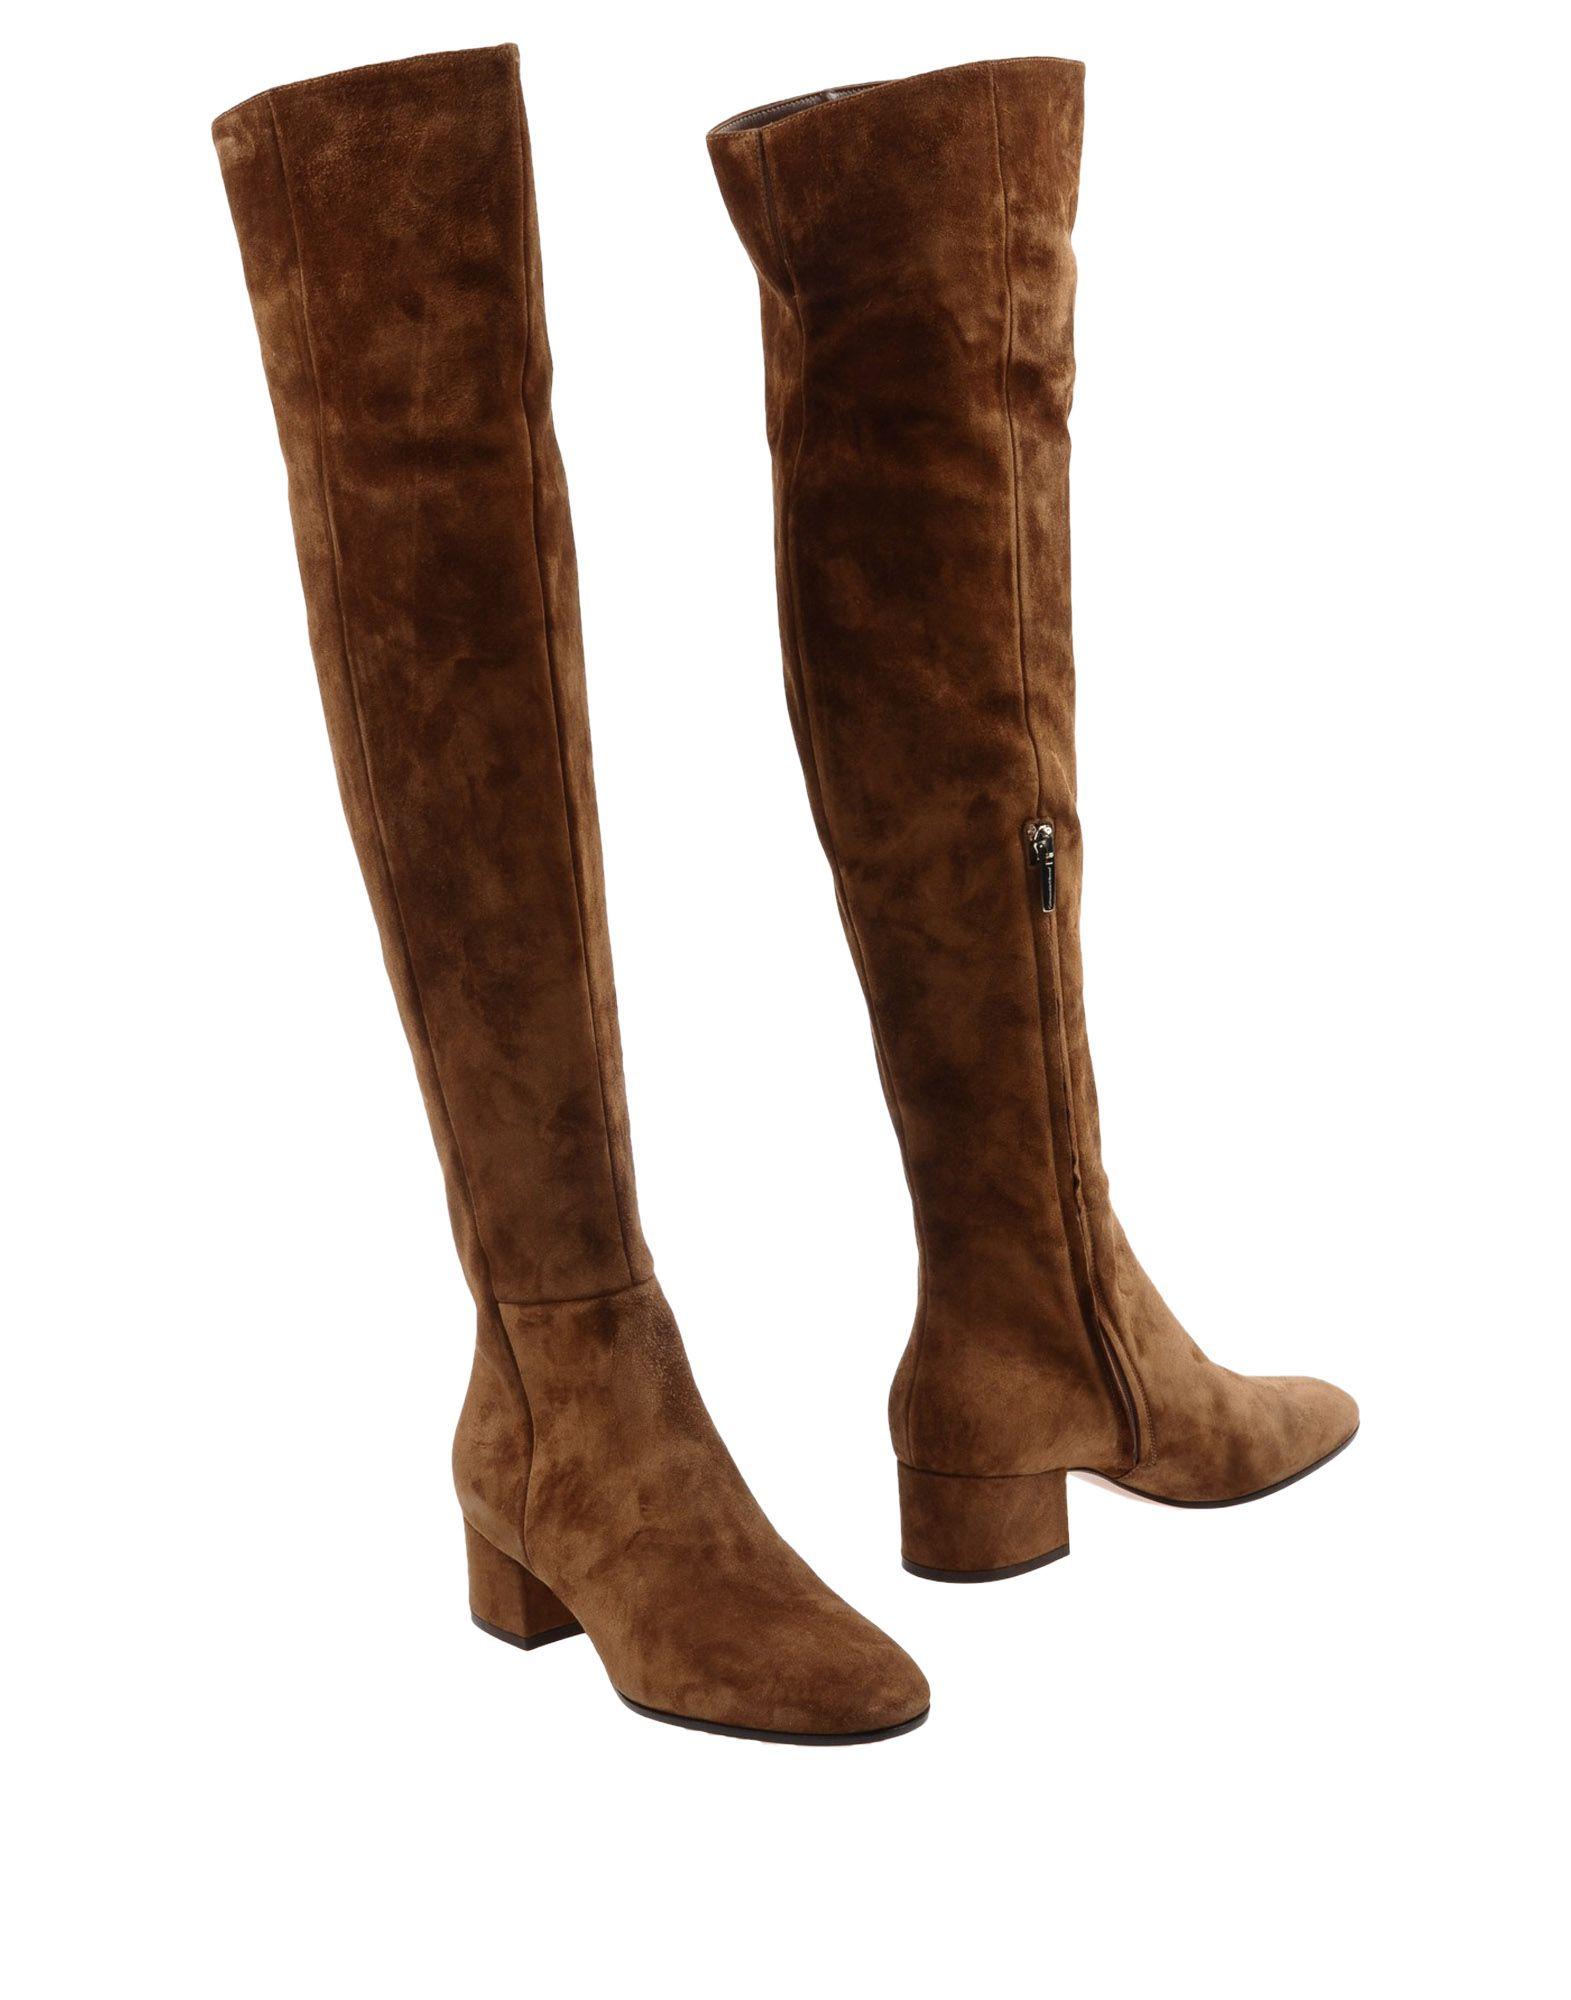 Gianvito Rossi Stiefel Damen Neue  11231566IS Neue Damen Schuhe 330868